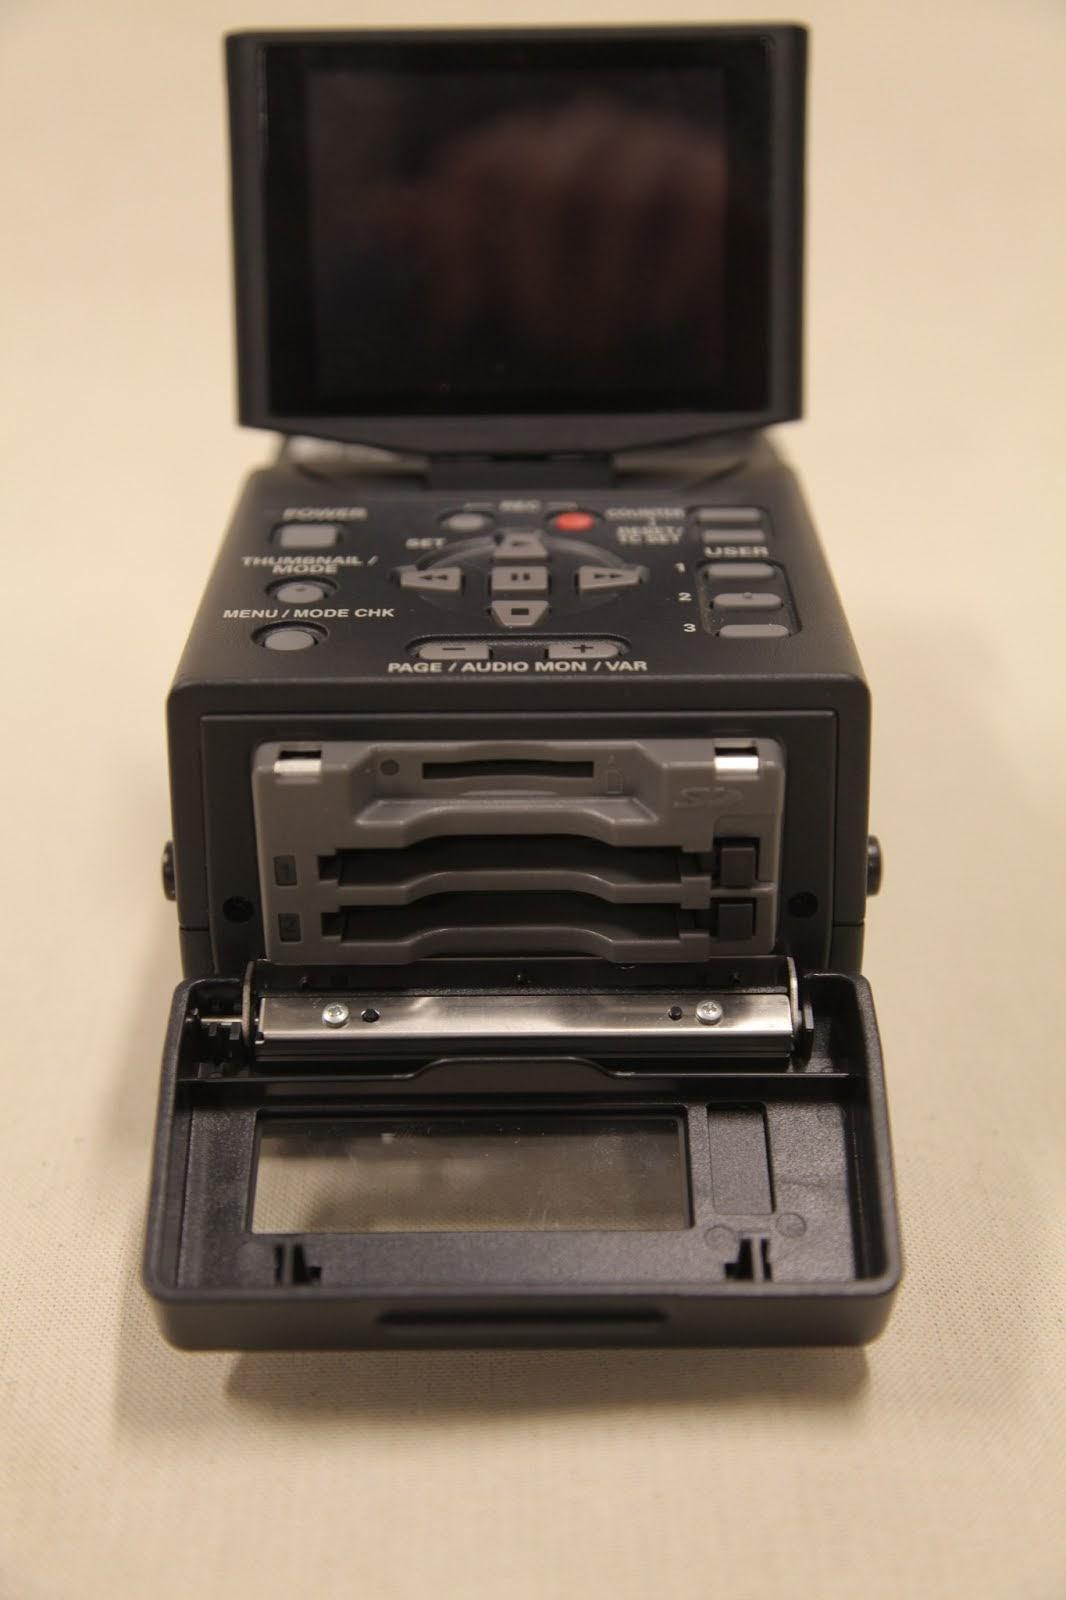 Panasonic Ag Hpg10 Portable P2 Gear Player Recorder